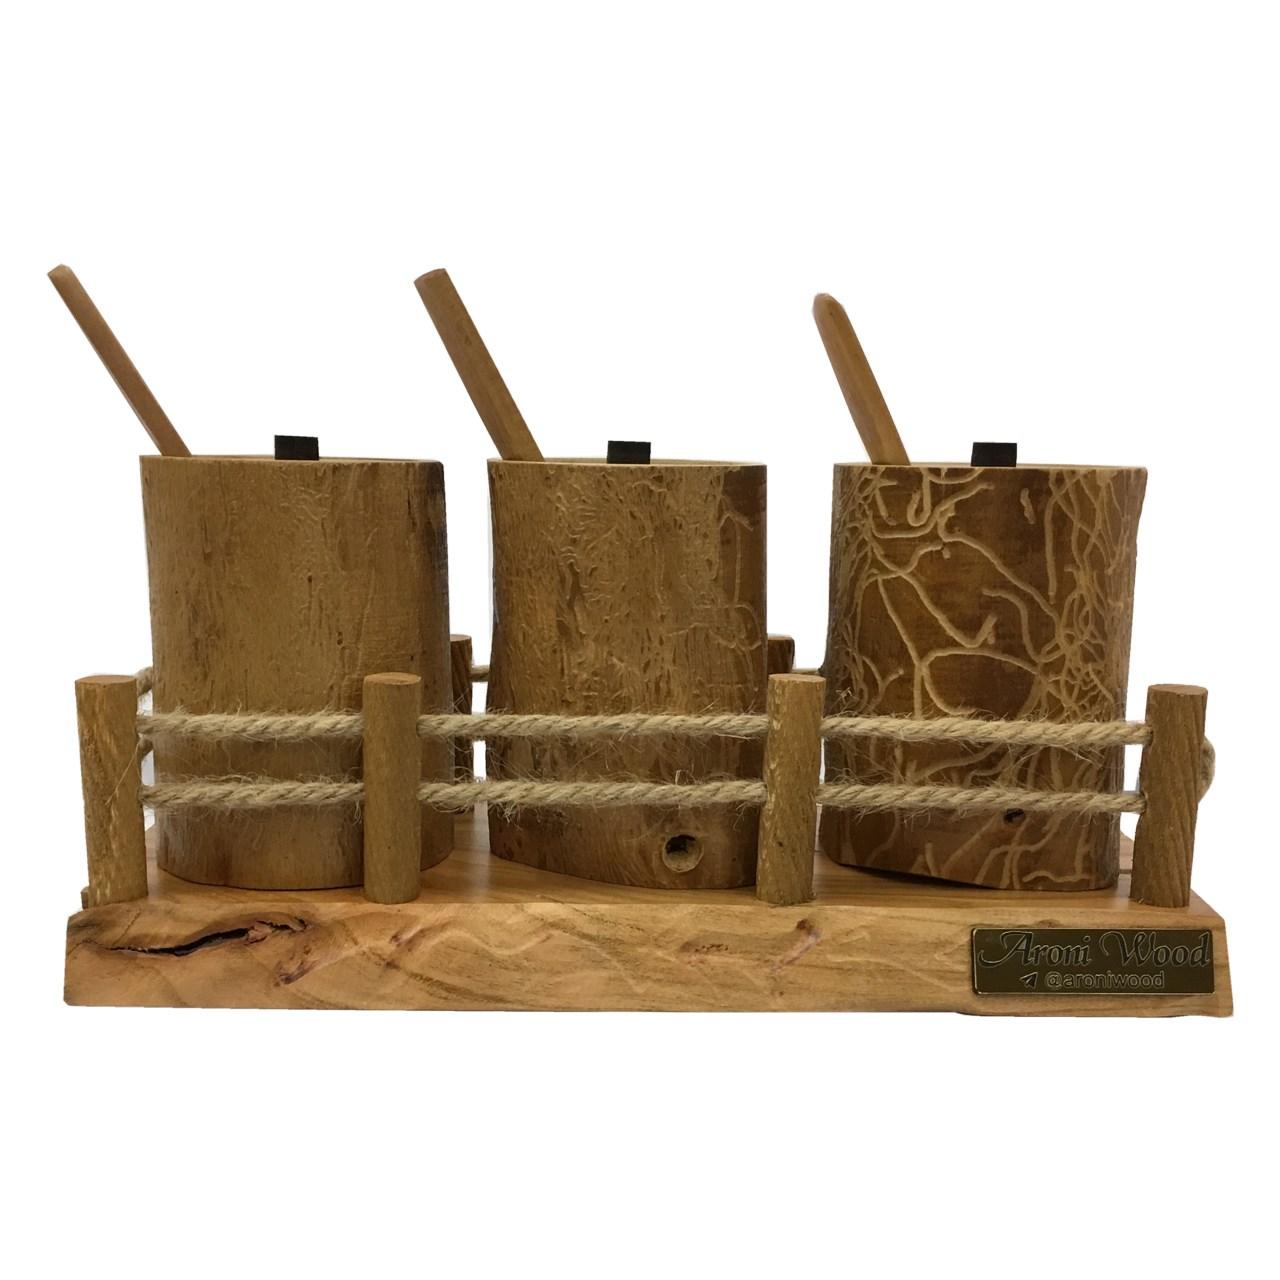 جا ادویه ای 3  پارچه آرونی چوب طرح روستیک مدل RONIKA